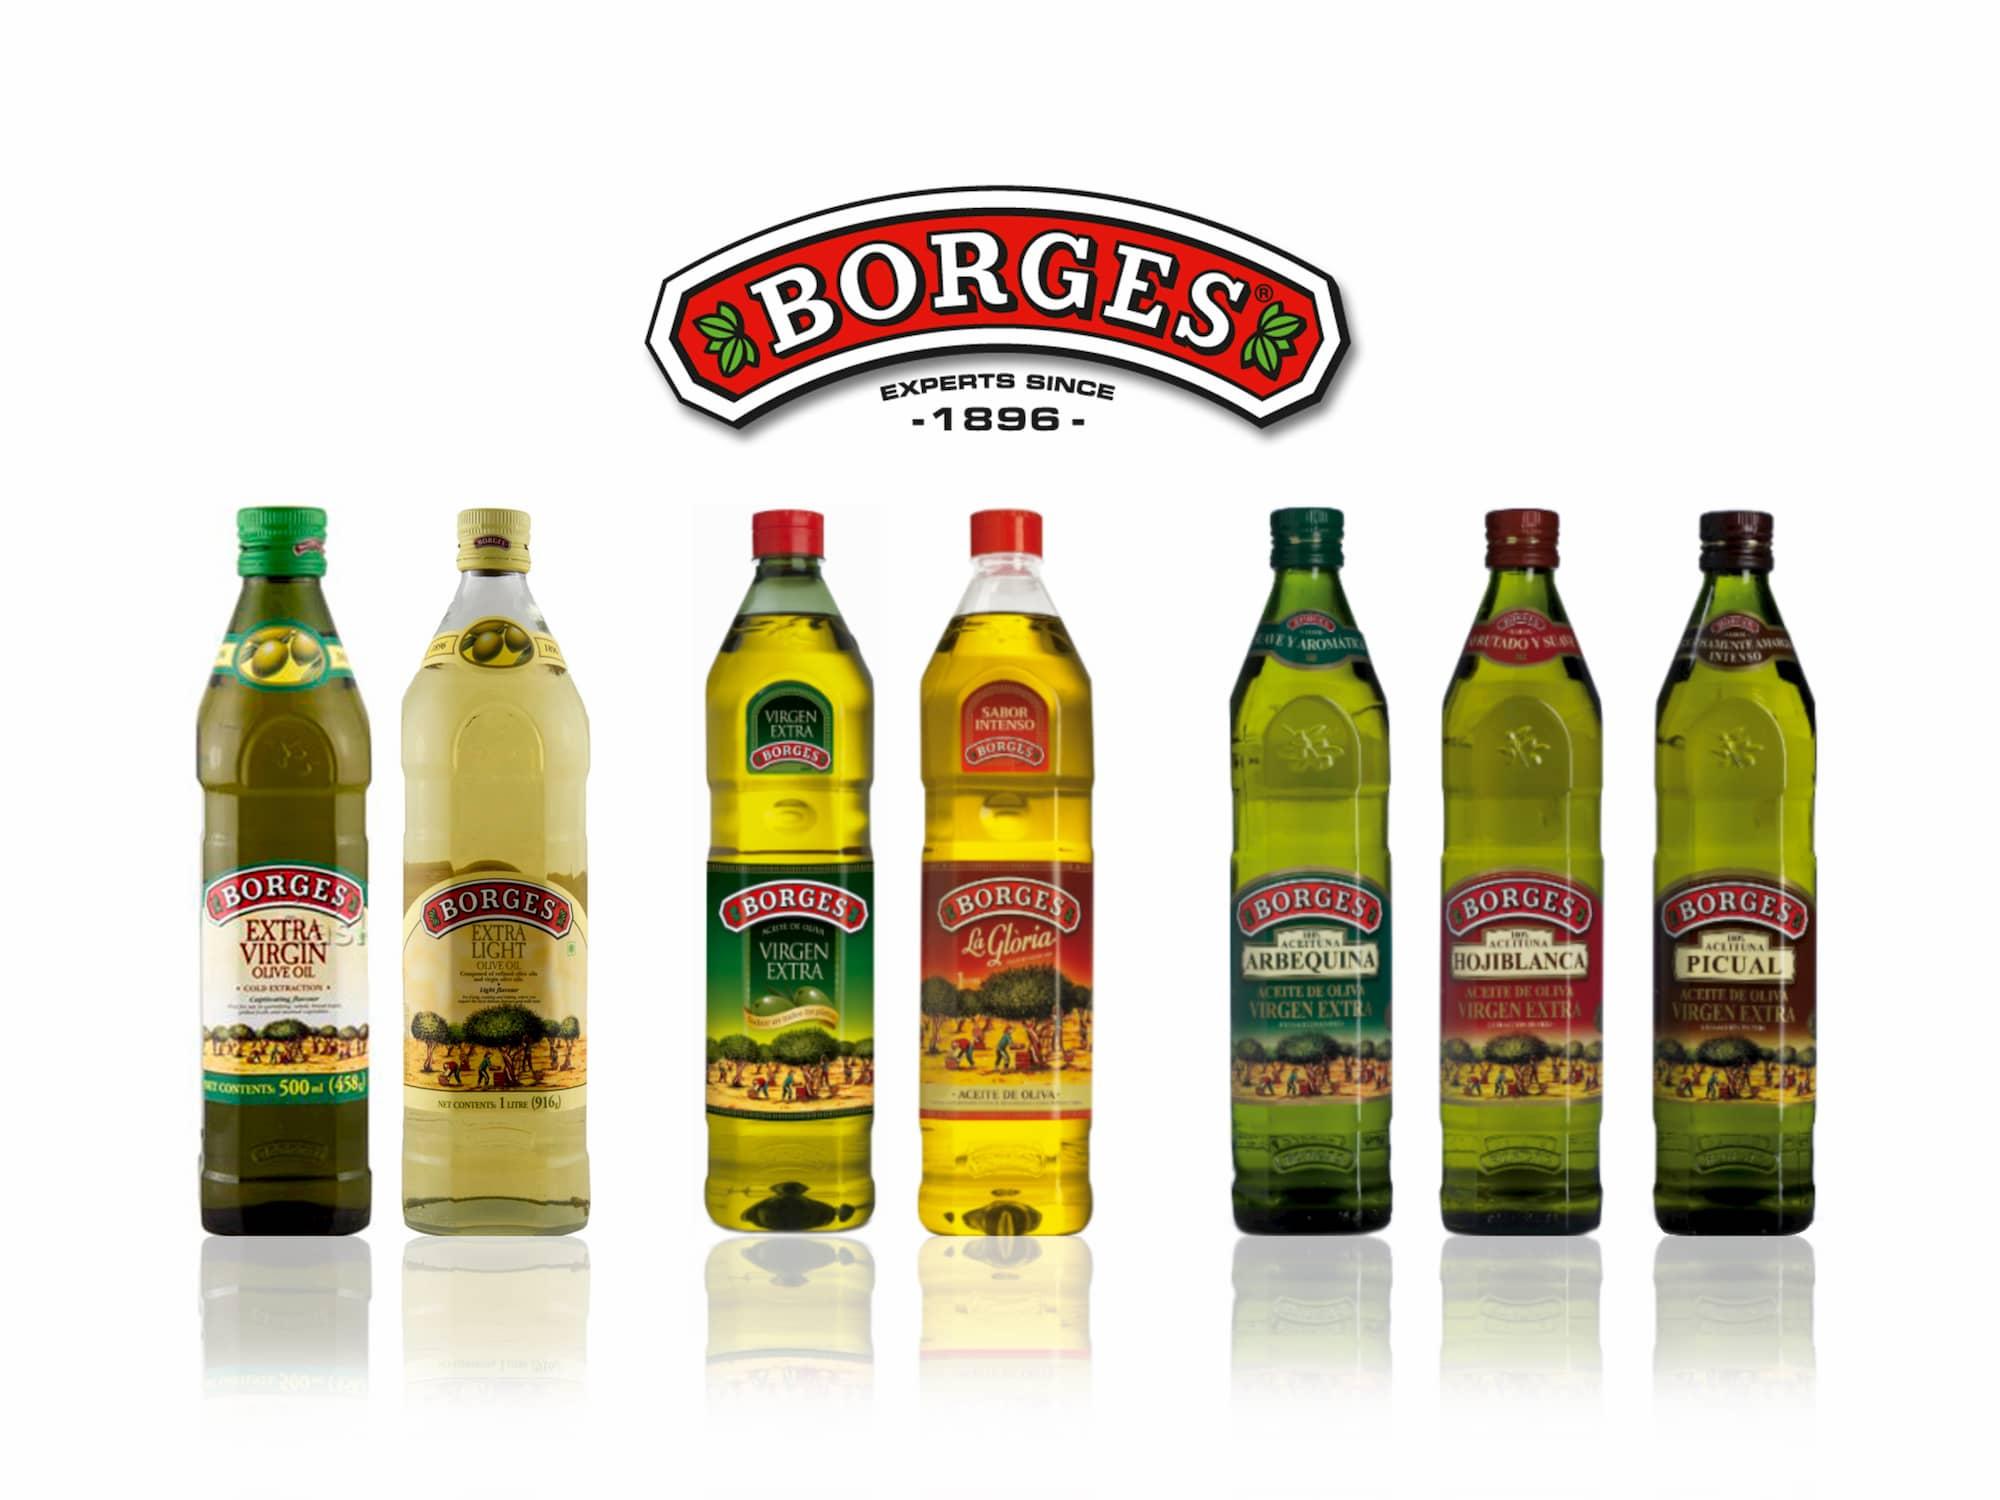 Borges antes